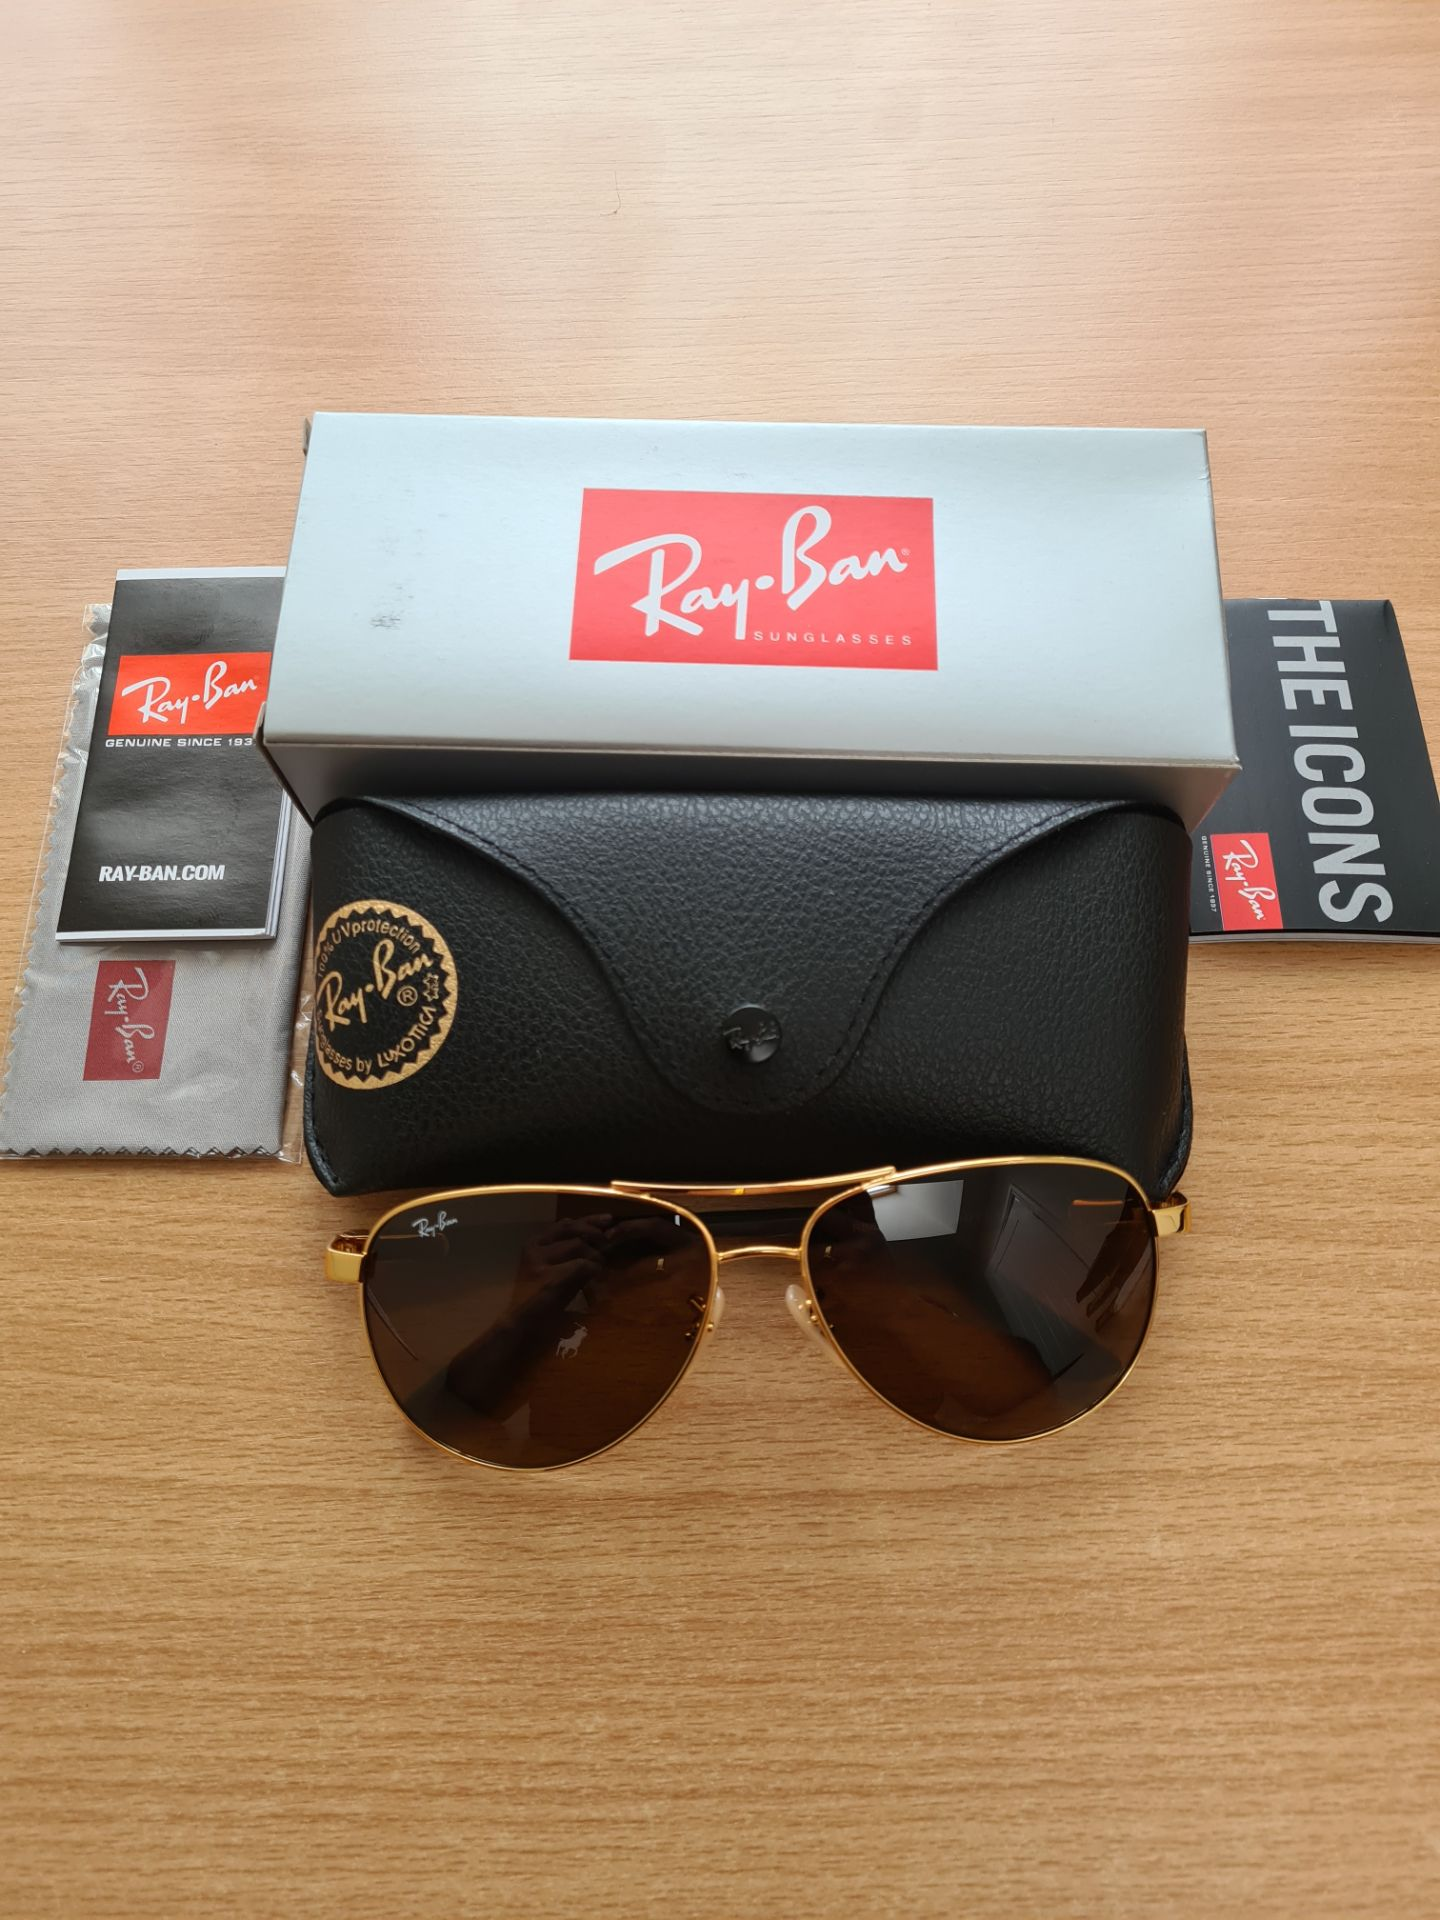 Ray Ban Sunglasses ORB8313 001/33 2N